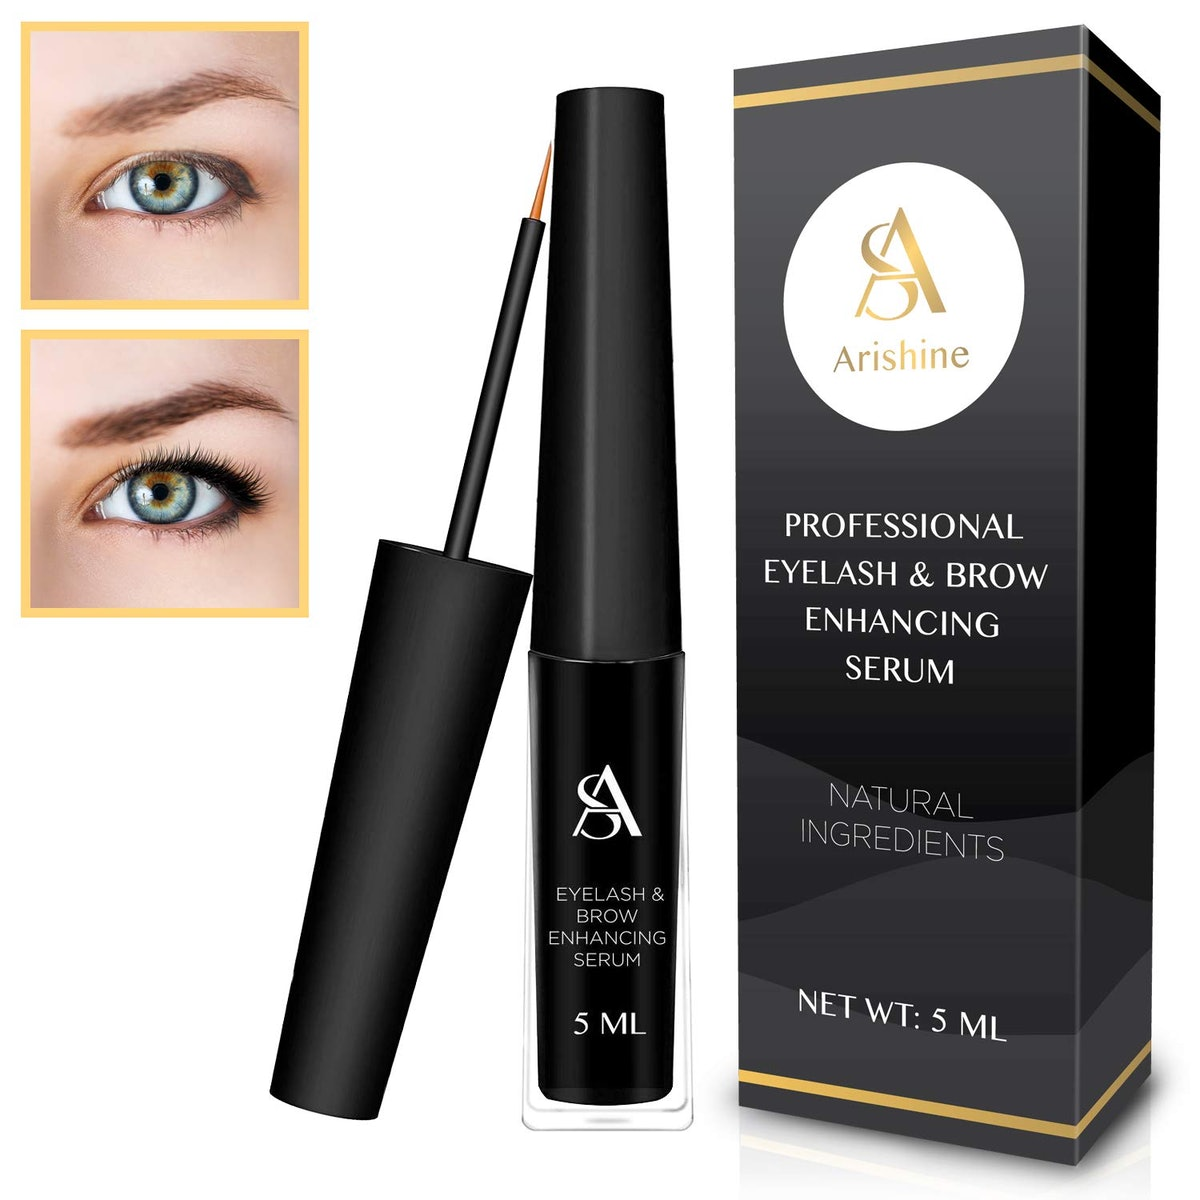 Arishine Eyelash & Eyebrow Enhancing Serum